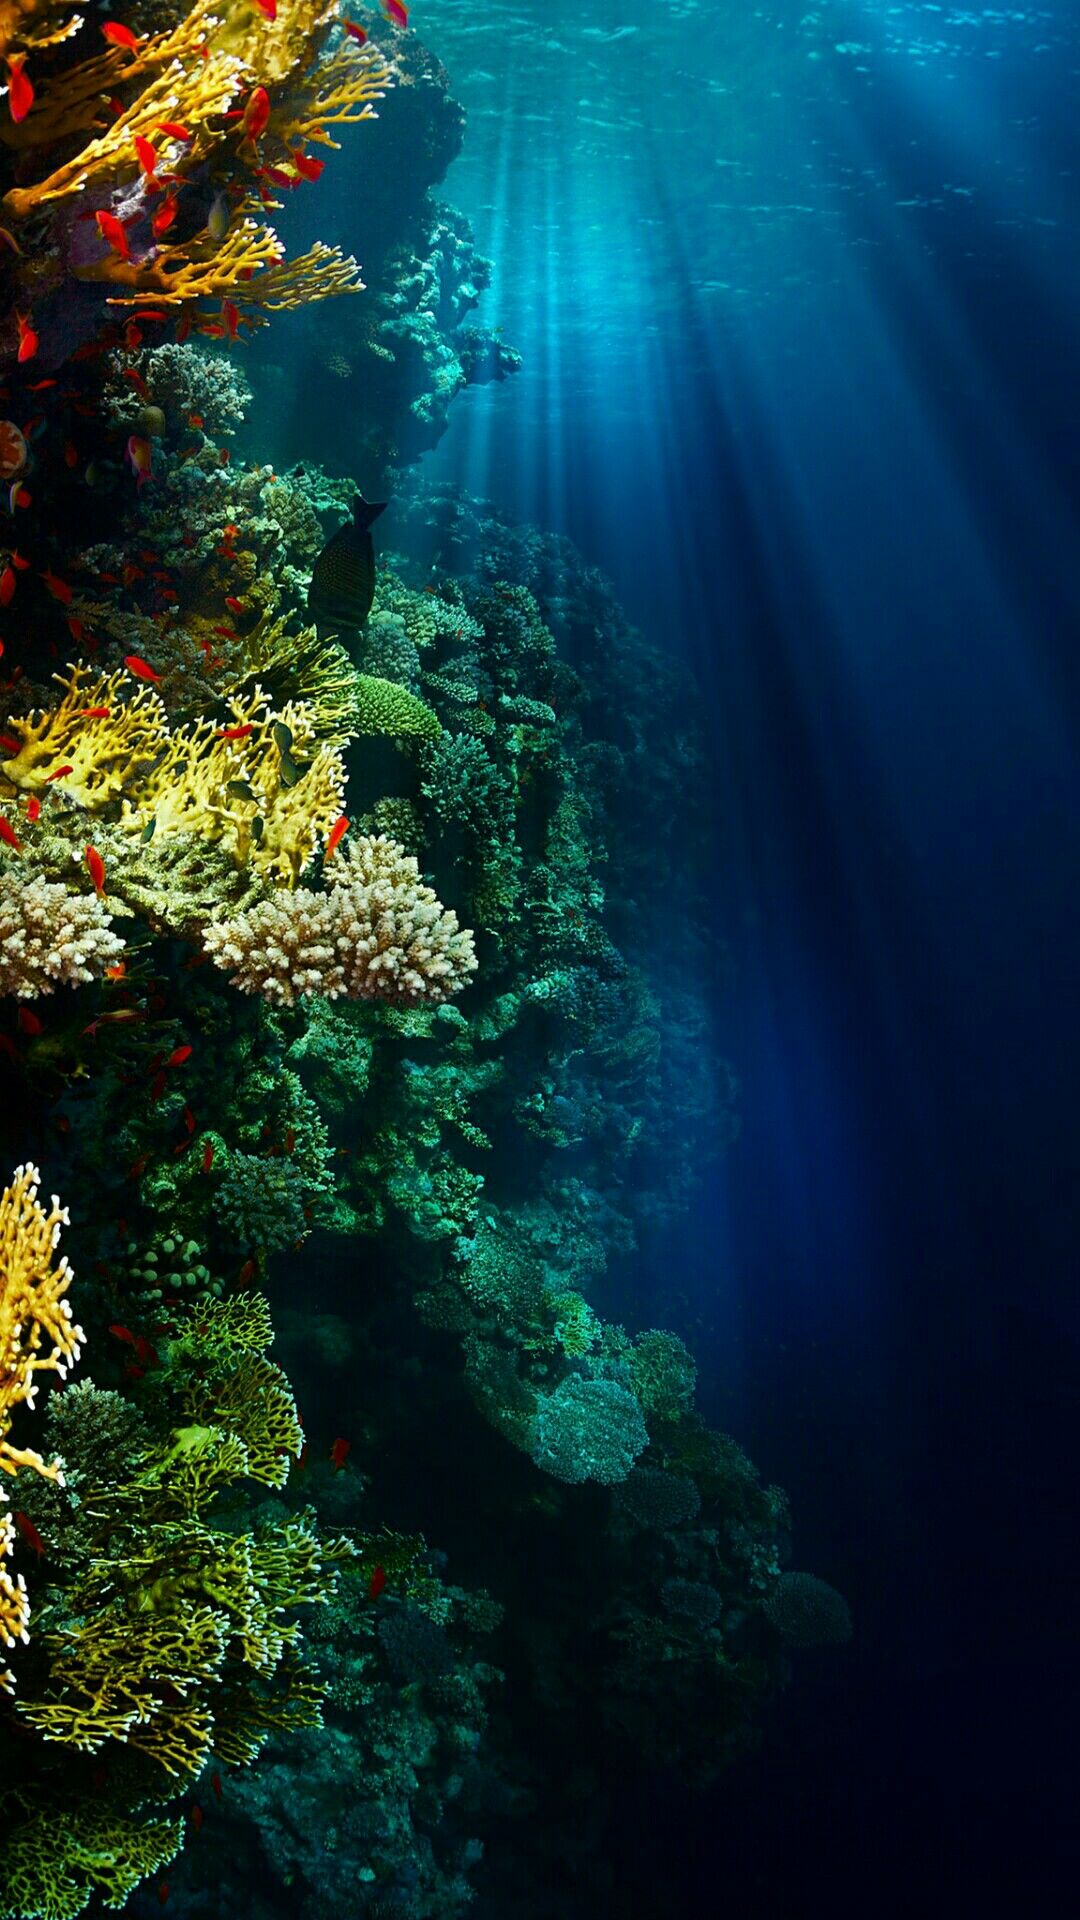 Underwater Wallpaper | *Beach, Island, Water and Rain Wallpapers in 2019 | Underwater wallpaper ...